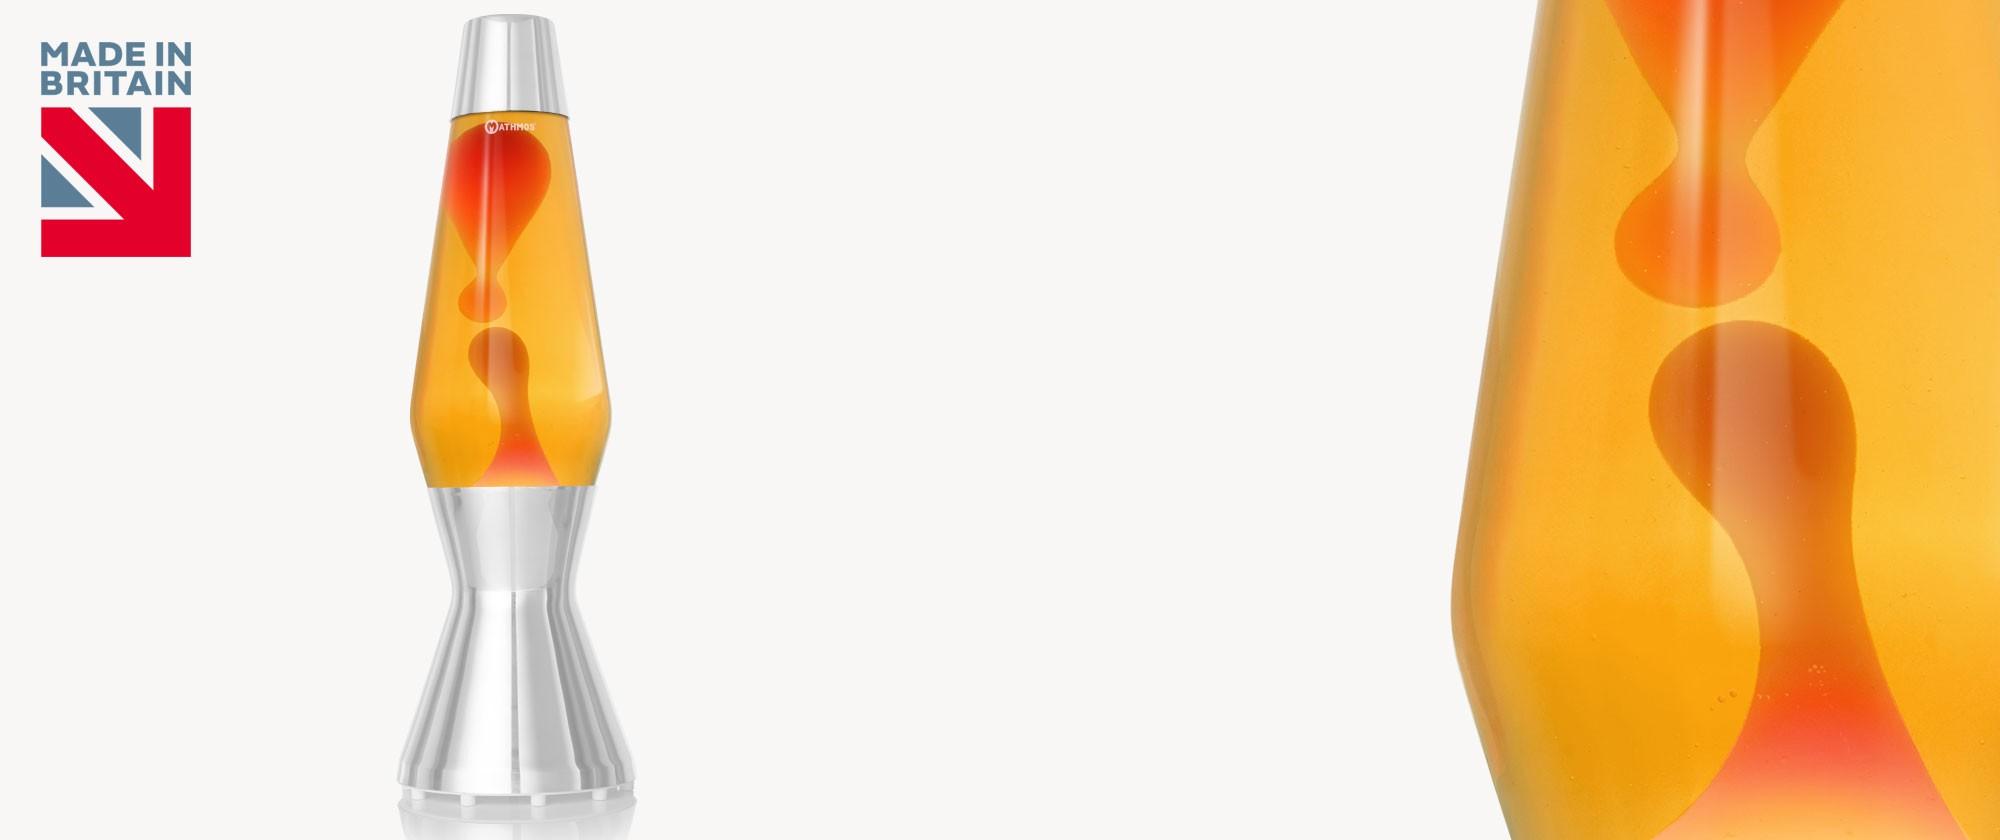 Astro lava lamp bottle Yellow-Orange